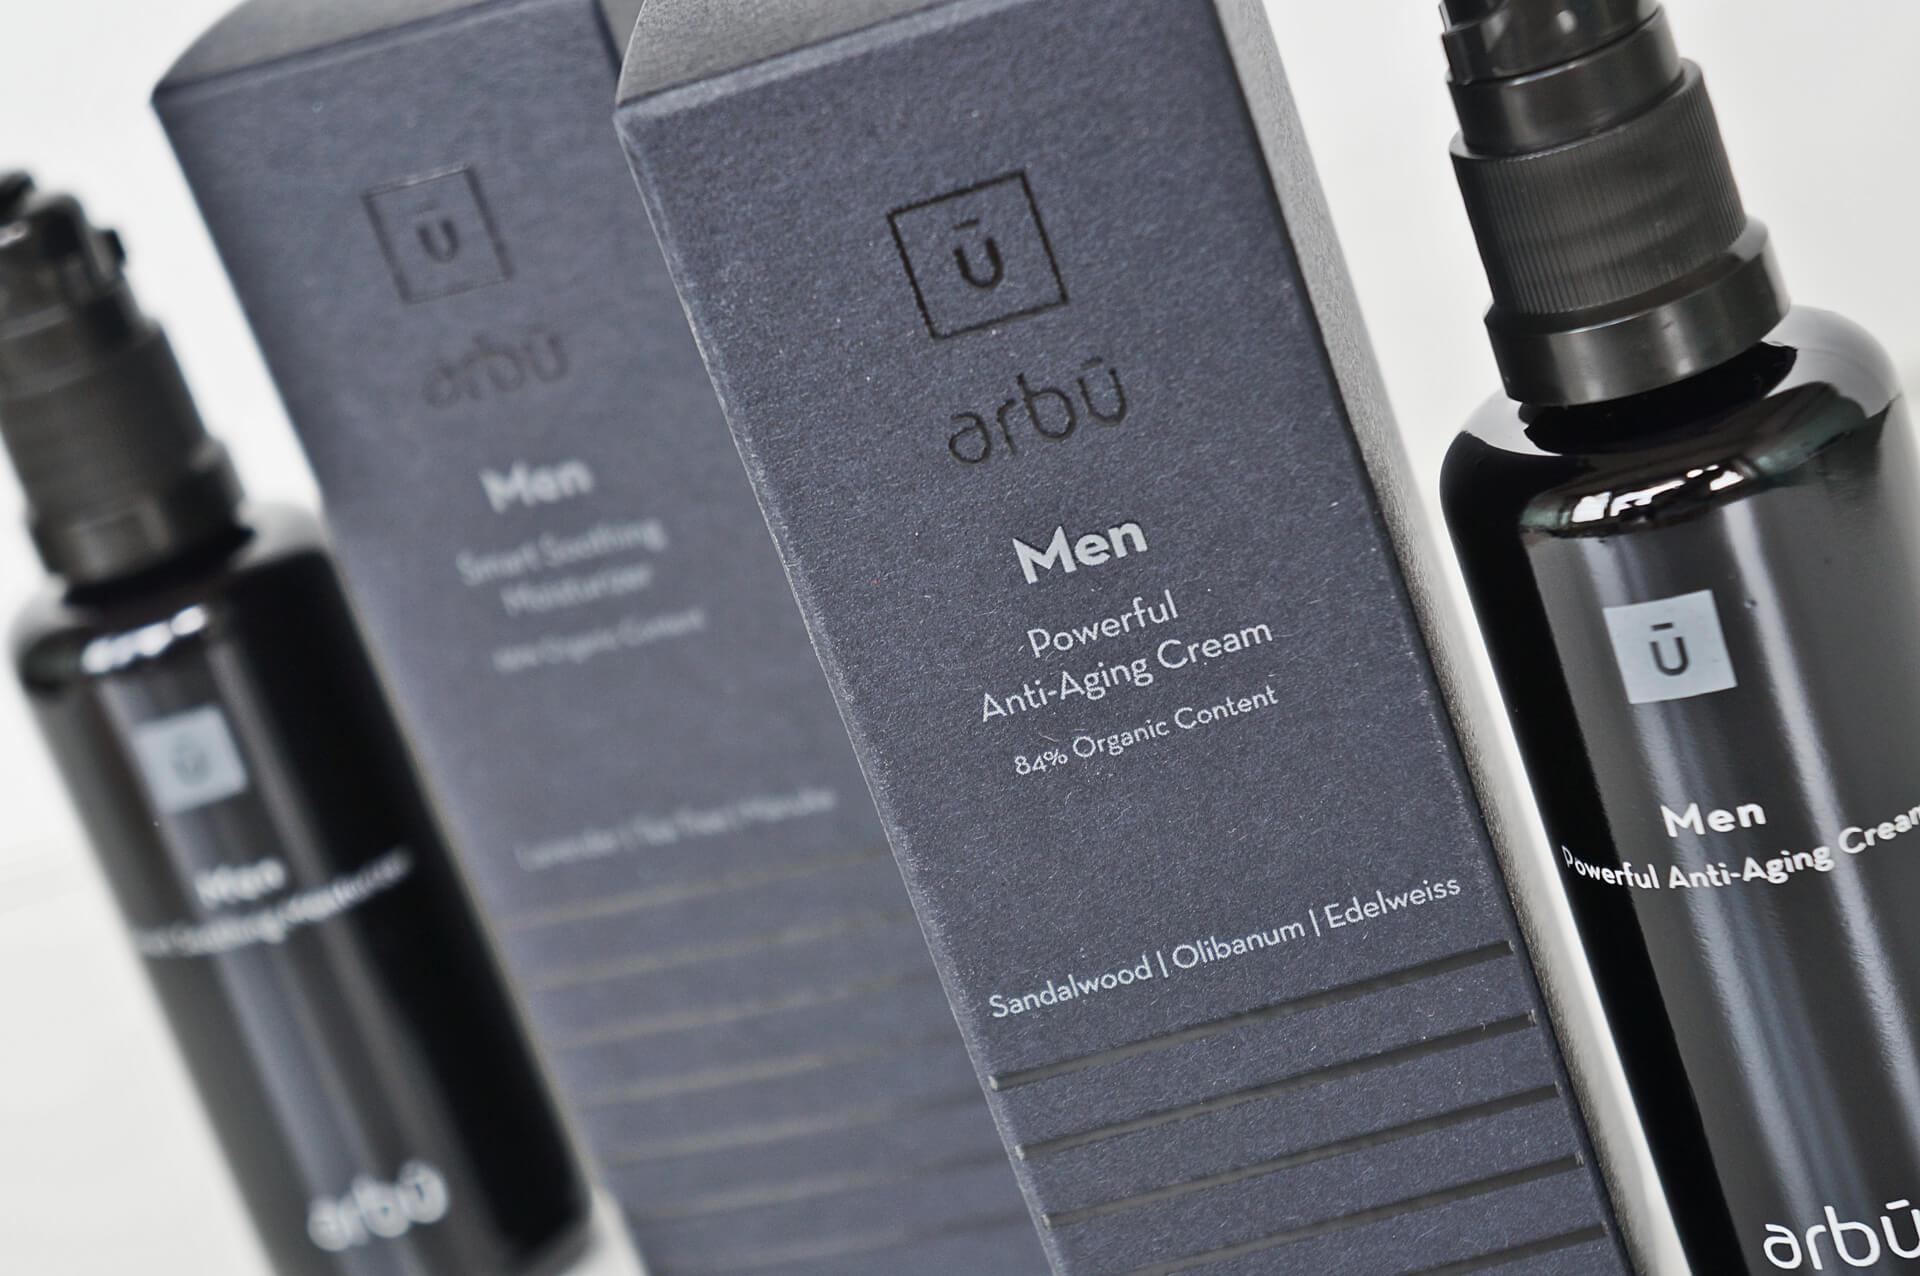 arbu men packaging labels